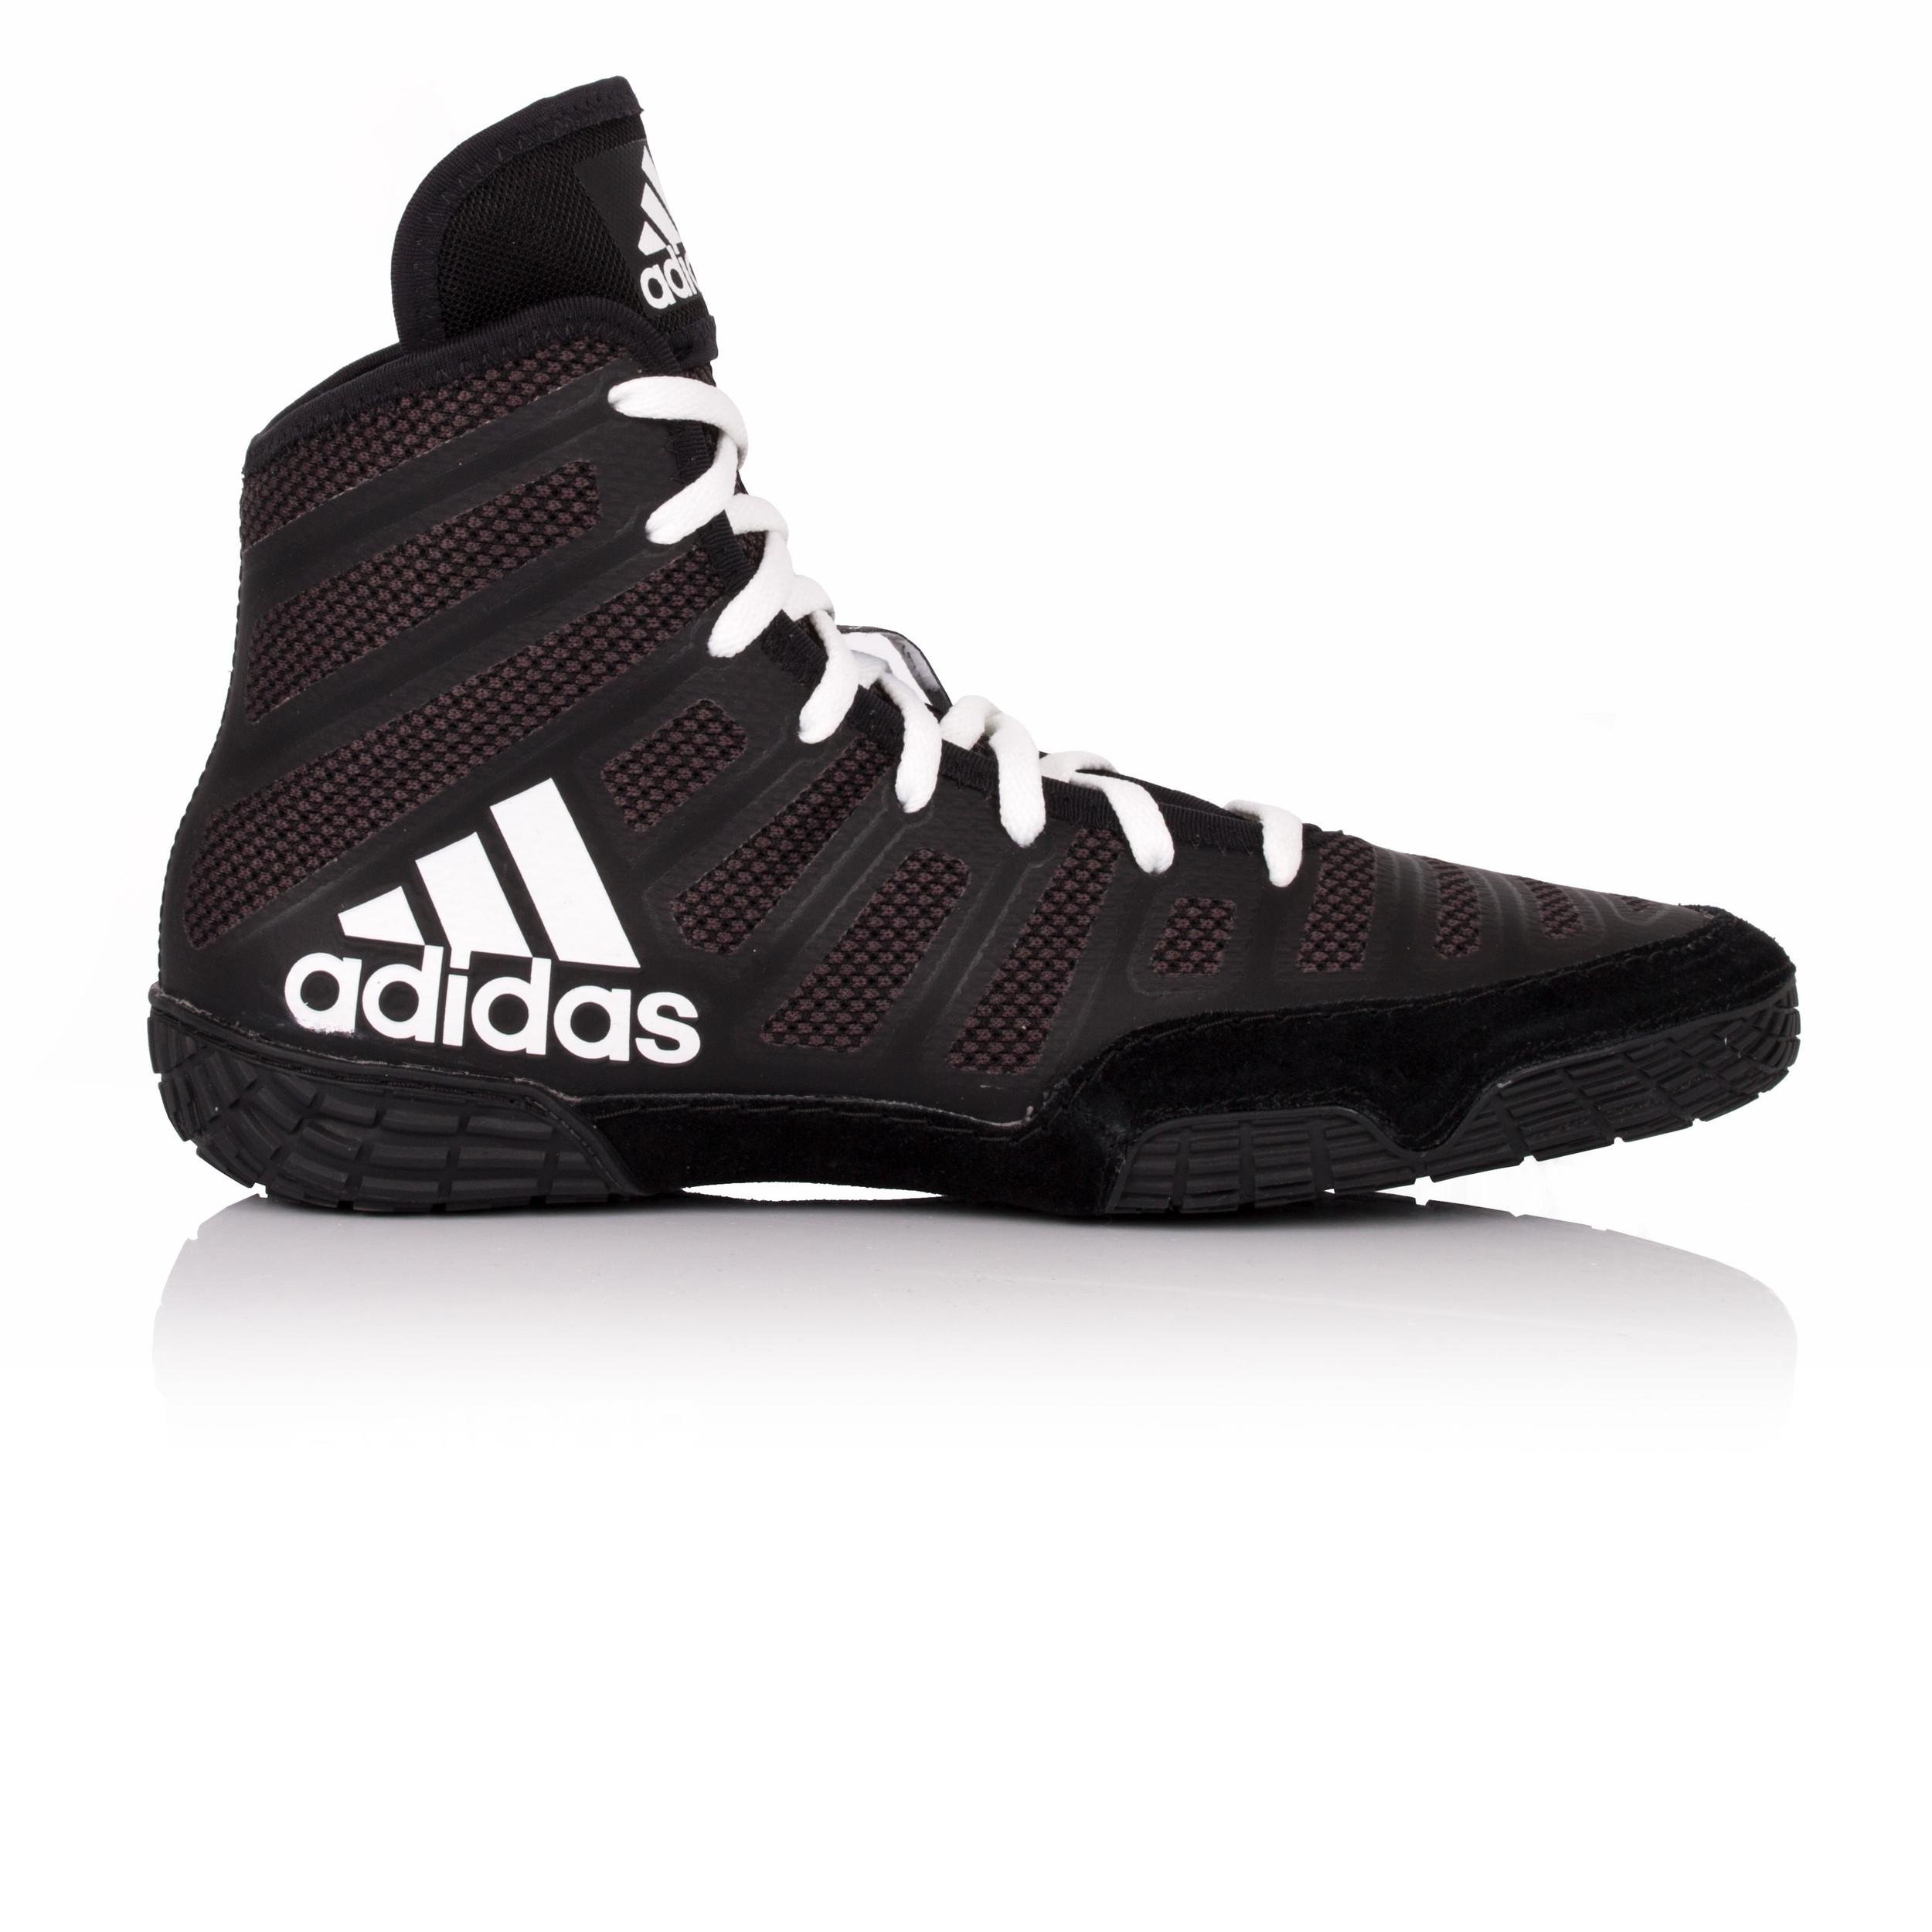 adidas herren schwarz varner schuhe ringerstiefel wrestling stiefel sportschuhe ebay. Black Bedroom Furniture Sets. Home Design Ideas